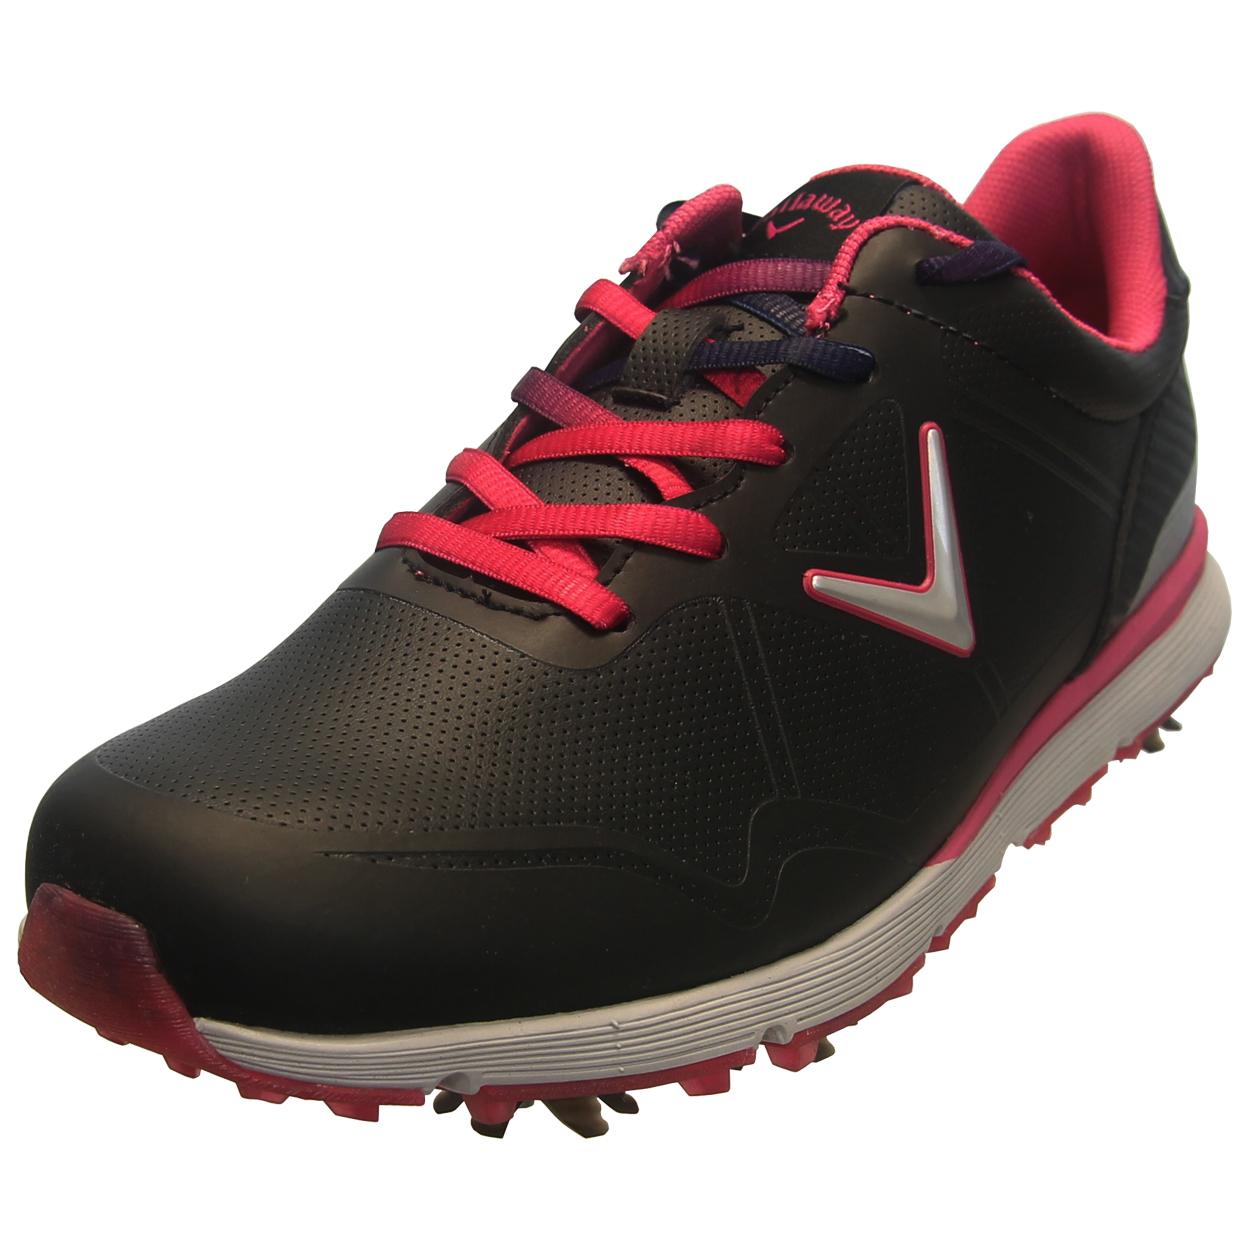 Callaway Halo Women'S Golf Shoe